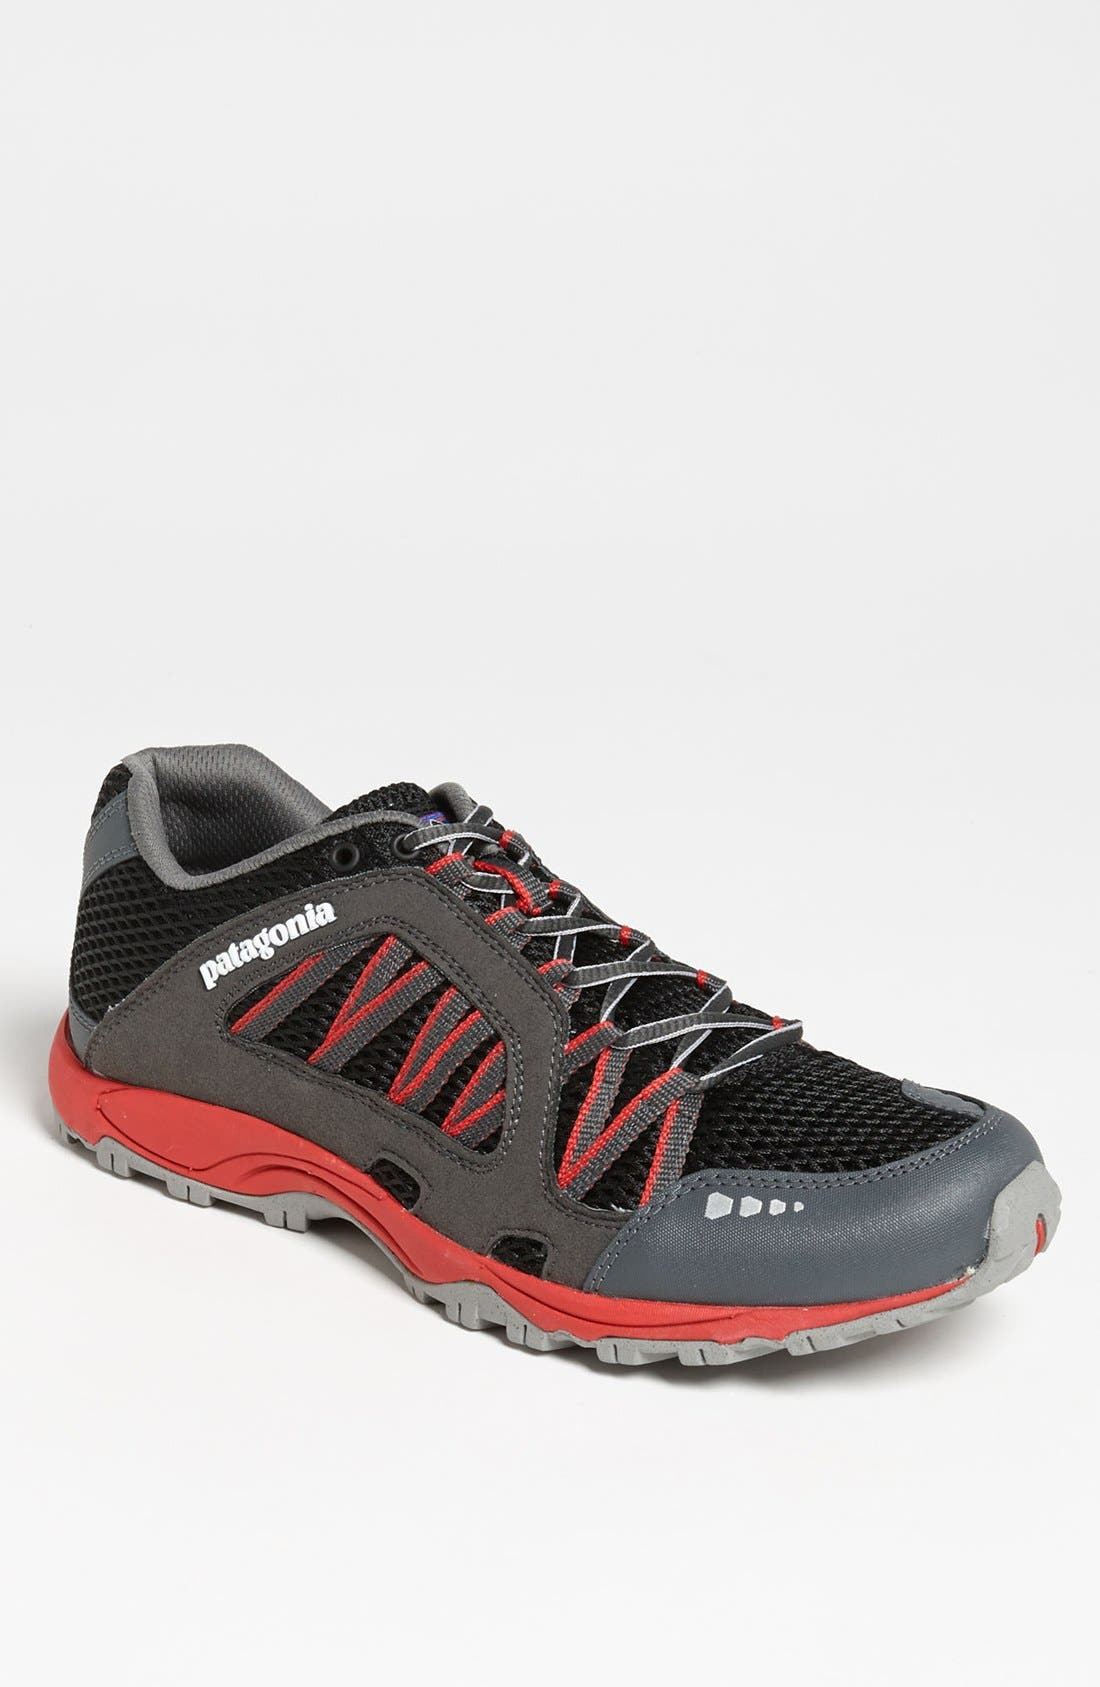 Alternate Image 1 Selected - Patagonia 'Fore Runner' Trail Running Shoe (Men)